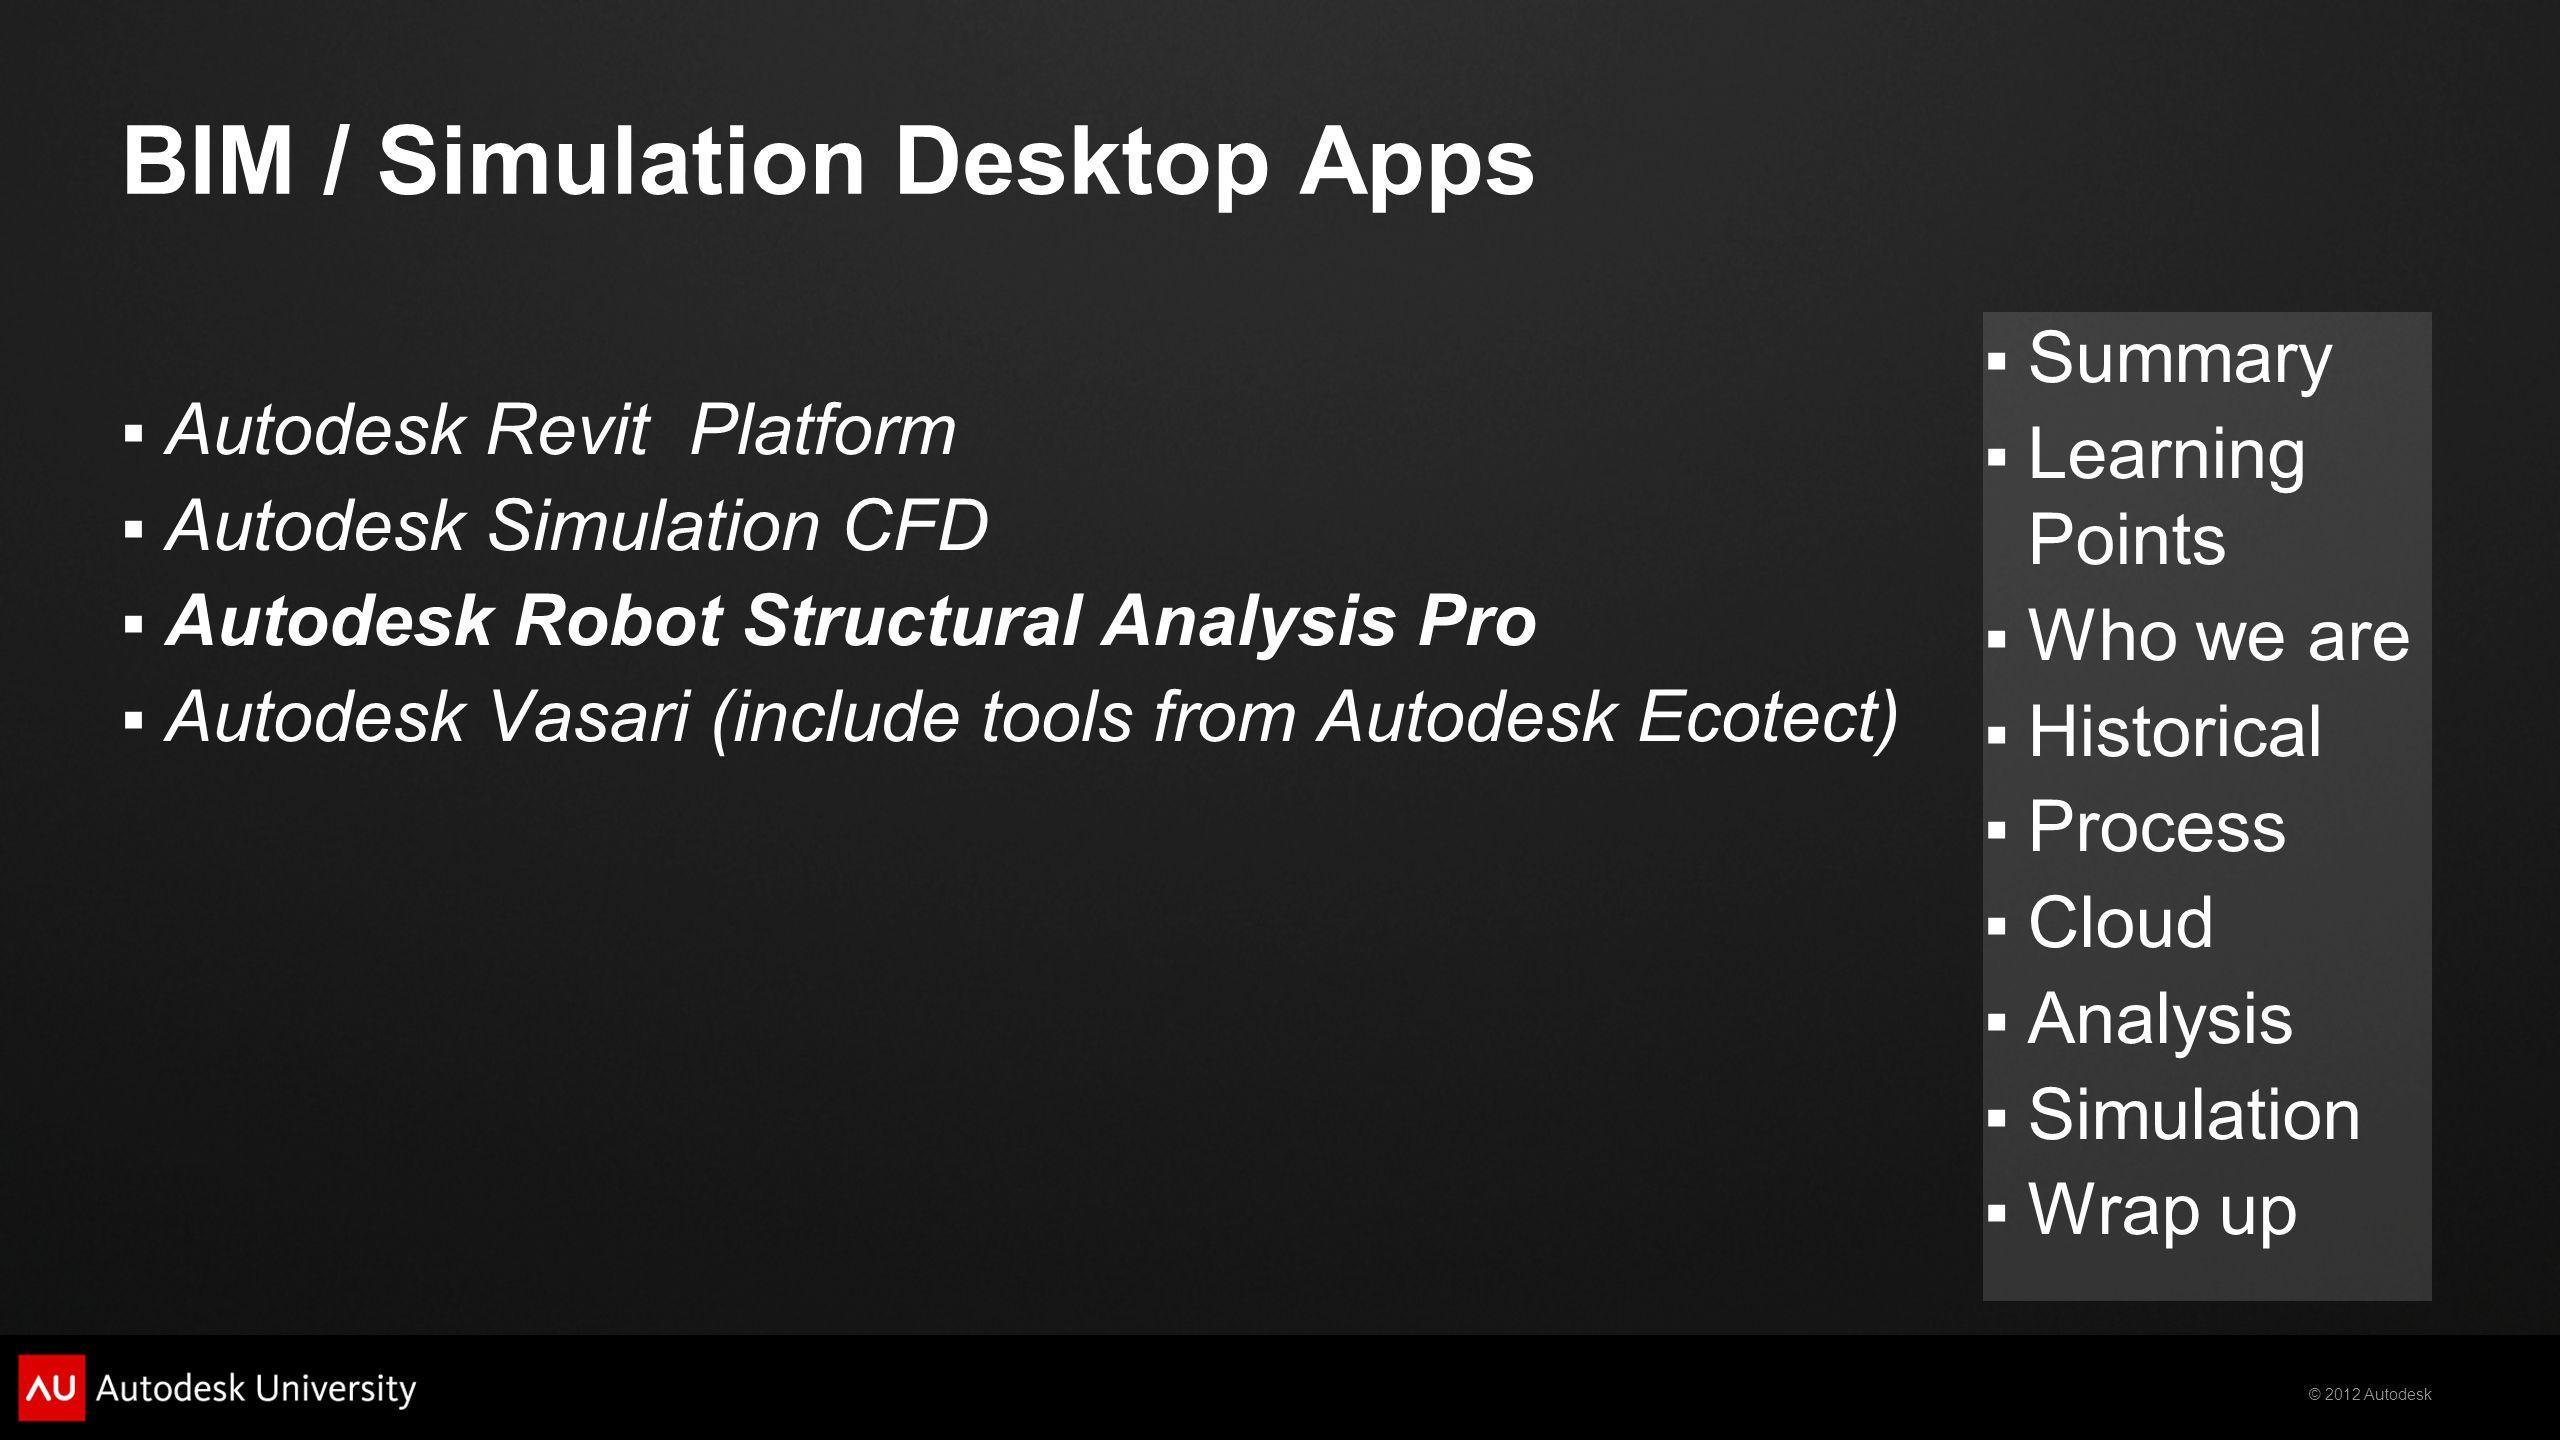 © 2012 Autodesk  Summary  Learning Points  Who we are  Historical  Process  Cloud  Analysis  Simulation  Wrap up BIM / Simulation Desktop Apps  Autodesk Revit Platform  Autodesk Simulation CFD  Autodesk Robot Structural Analysis Pro  Autodesk Vasari (include tools from Autodesk Ecotect)